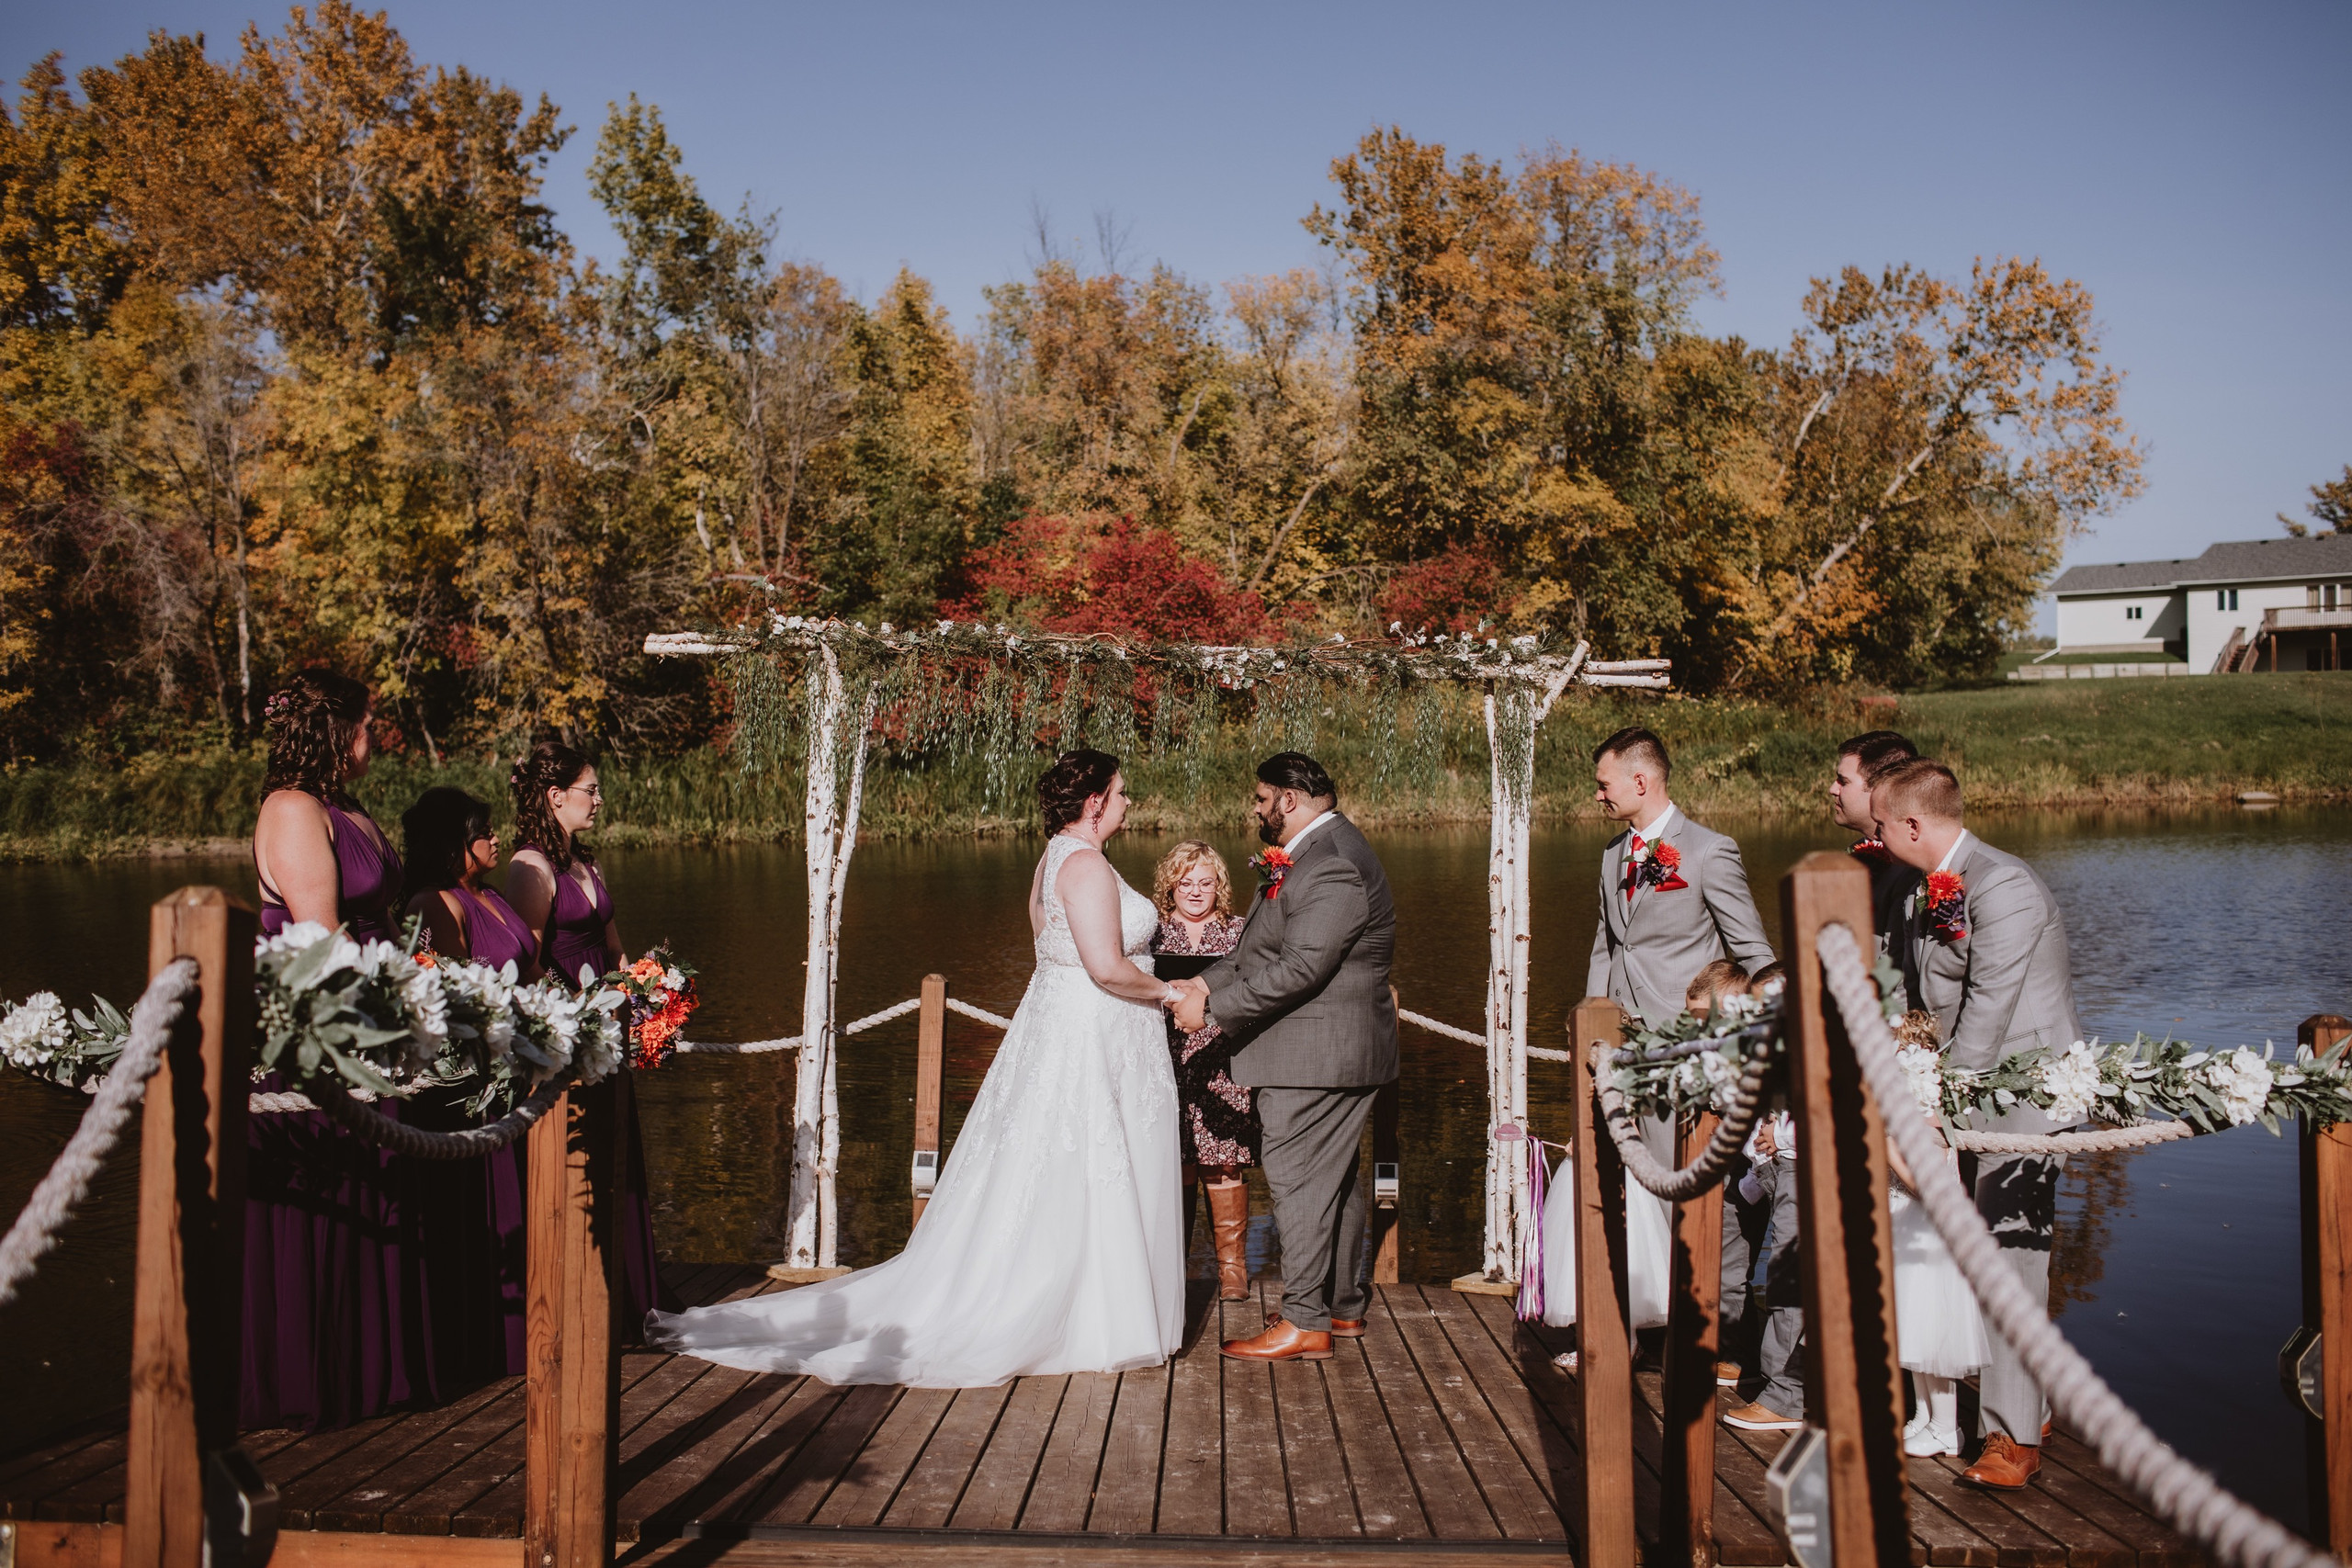 Fall Dock Wedding Ceremony at Rivers Edge Resort.